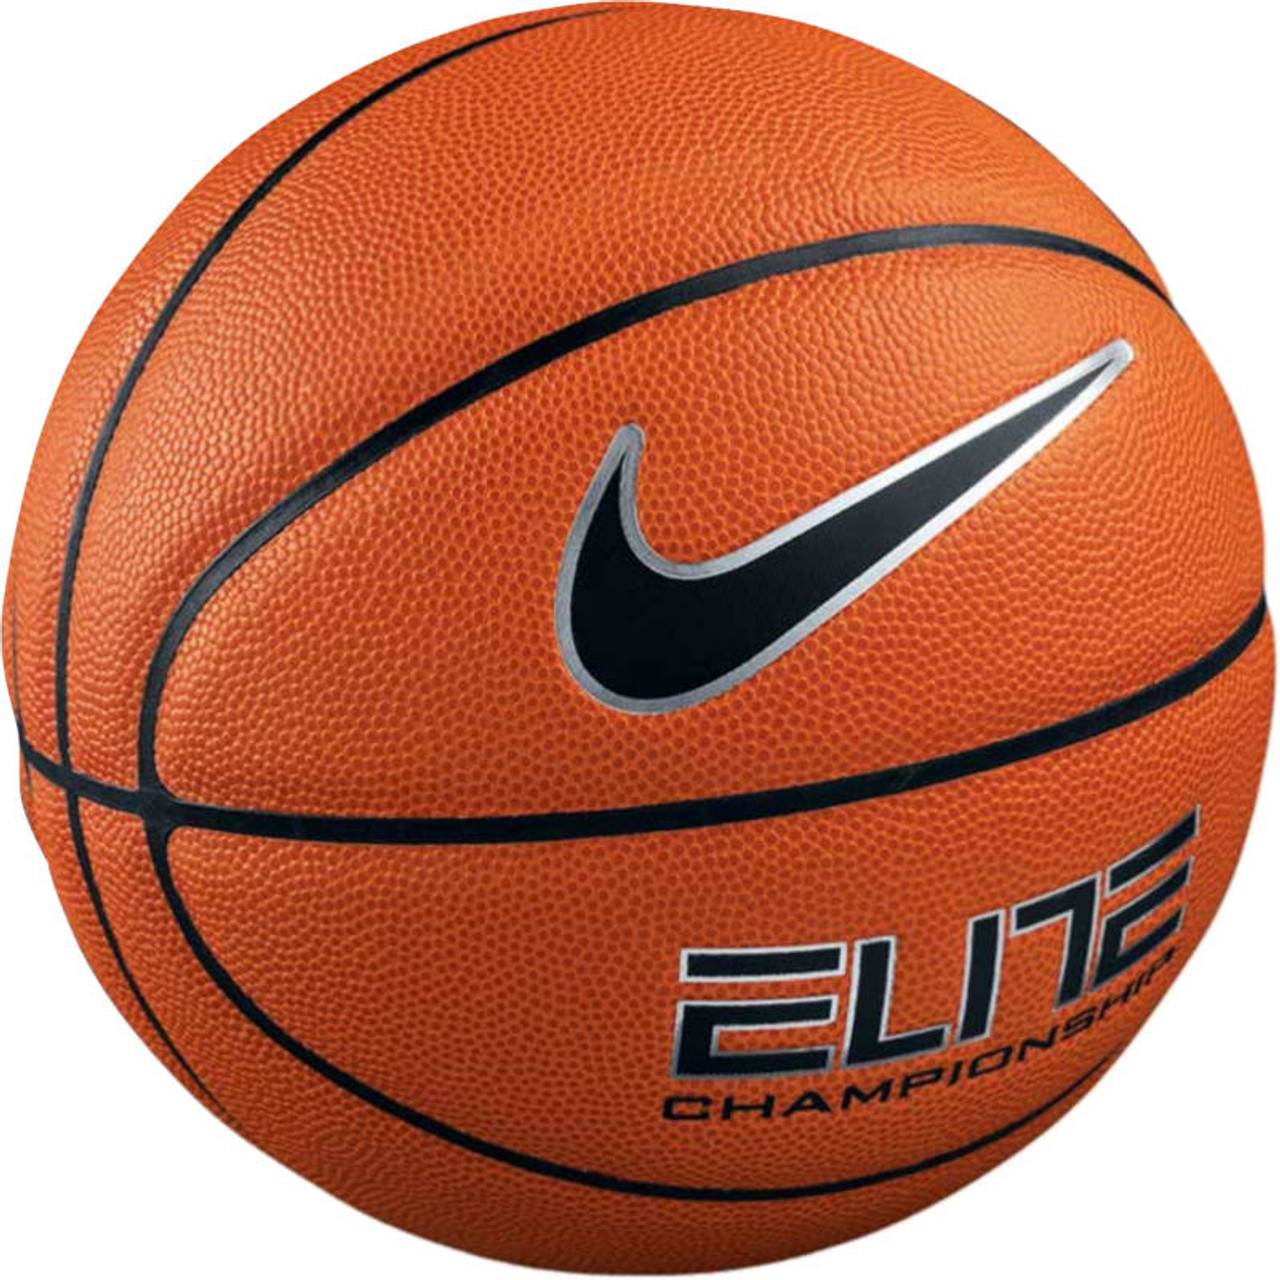 bonito diseño mejor venta Códigos promocionales Nike Elite Championship 8-Panel (Size 6) Basketball - Amber/Black ...